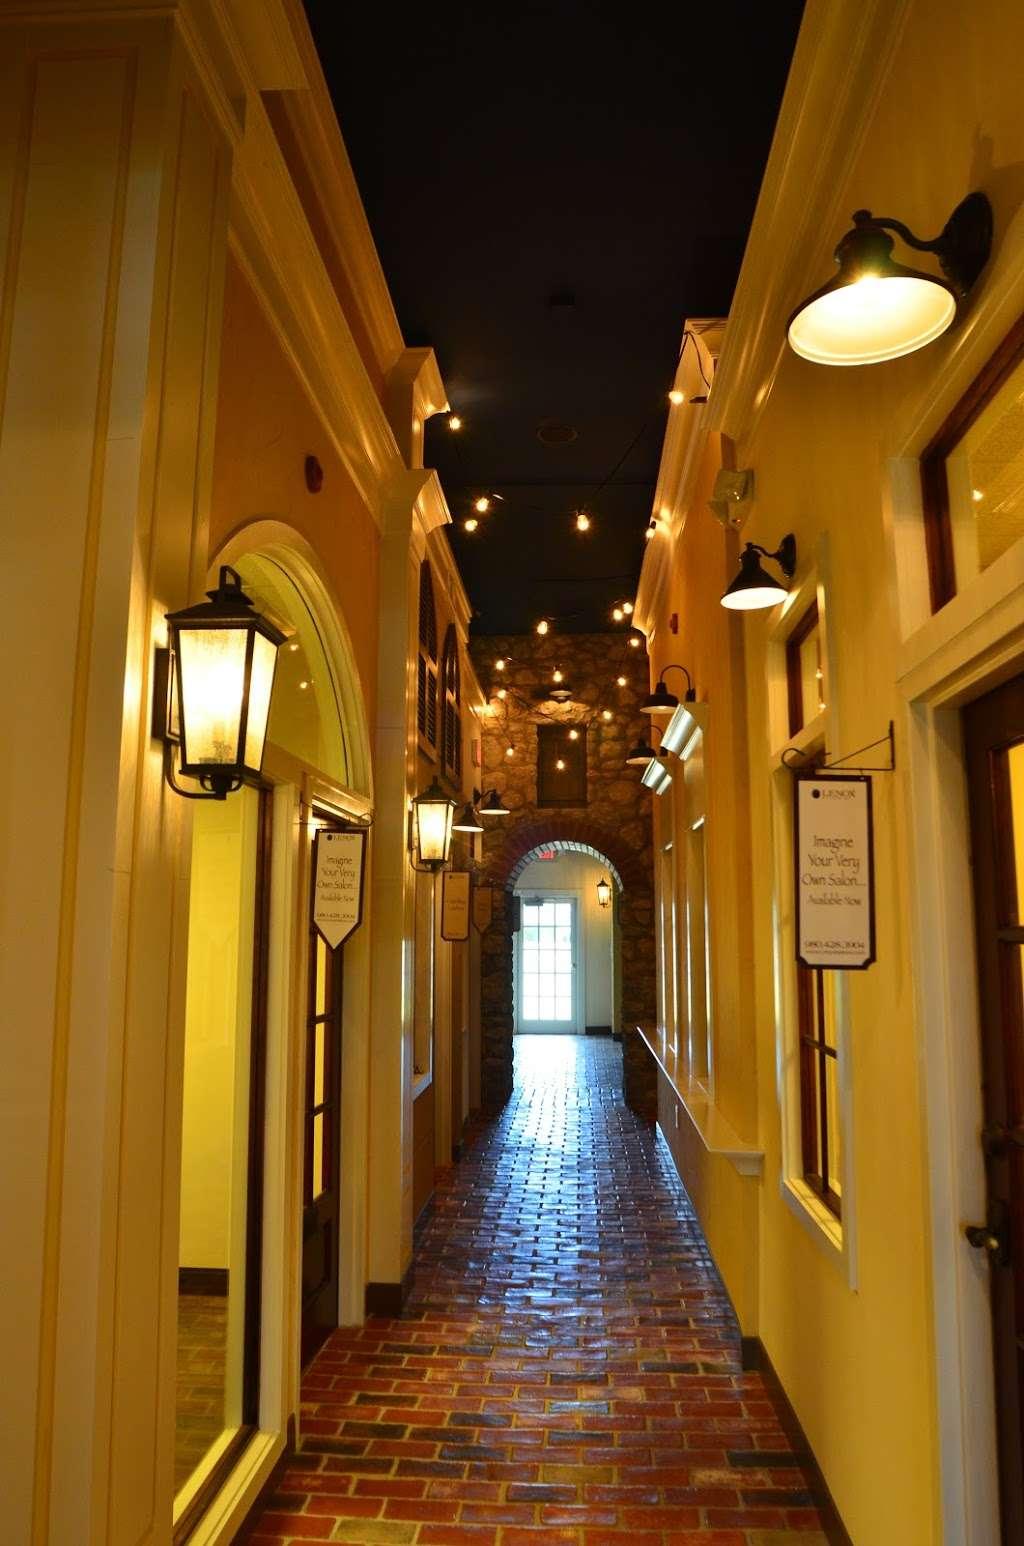 Lenox Salons - Luxury Salon Suites Huntersville, North Carolina - hair care  | Photo 7 of 10 | Address: 16623 Birkdale Commons Pkwy #130a, Huntersville, NC 28078, USA | Phone: (704) 578-2905